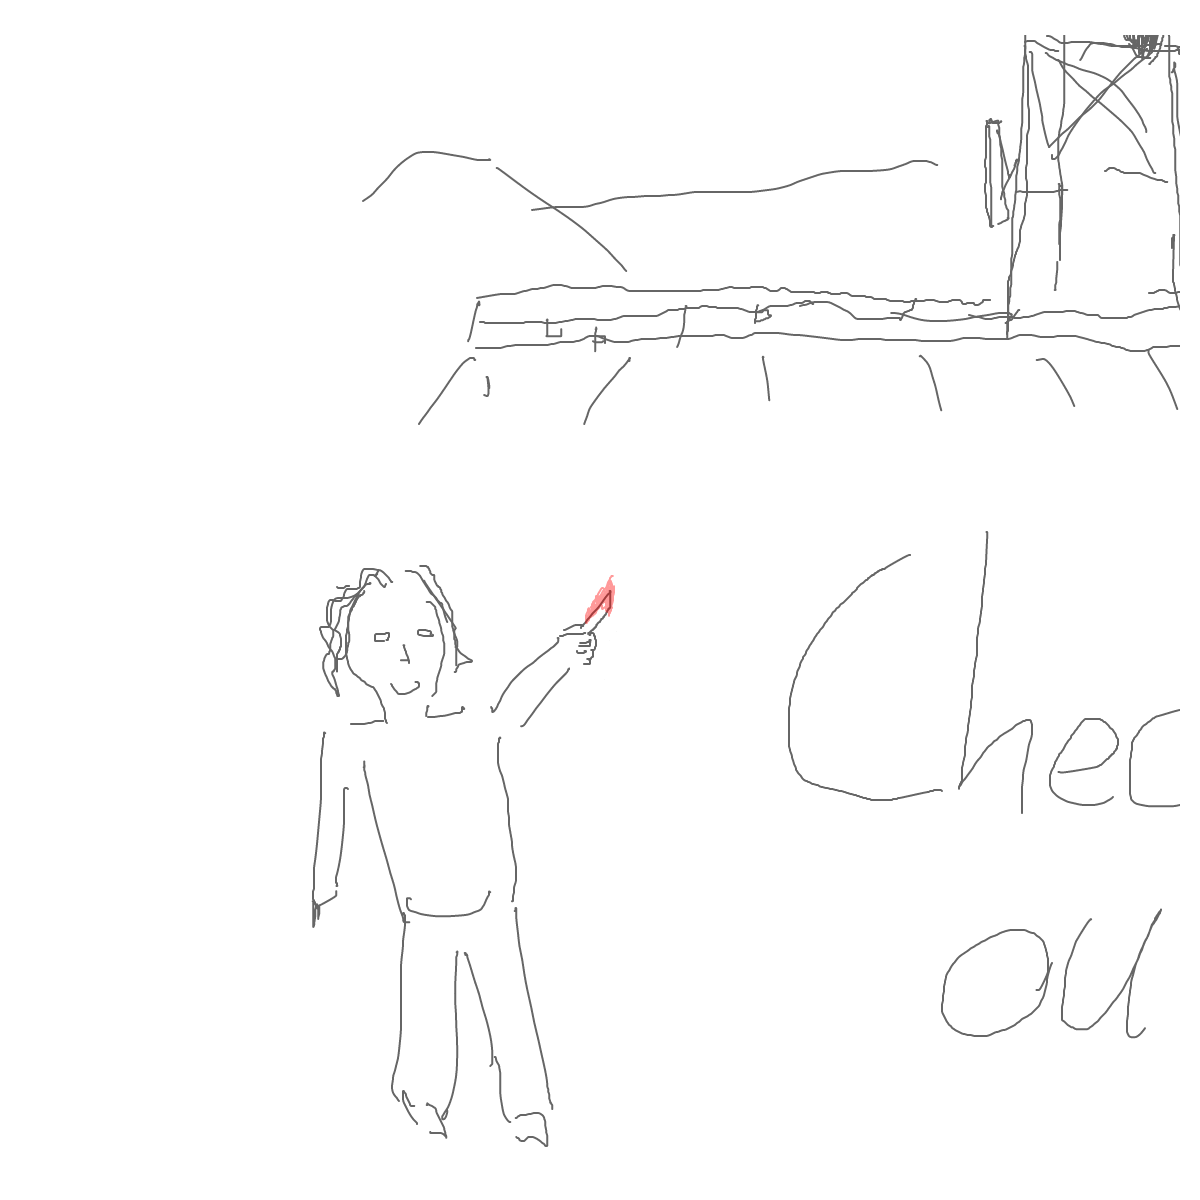 BAAAM drawing#9327 lat:41.7283744812011700lng: 13.2908363342285160